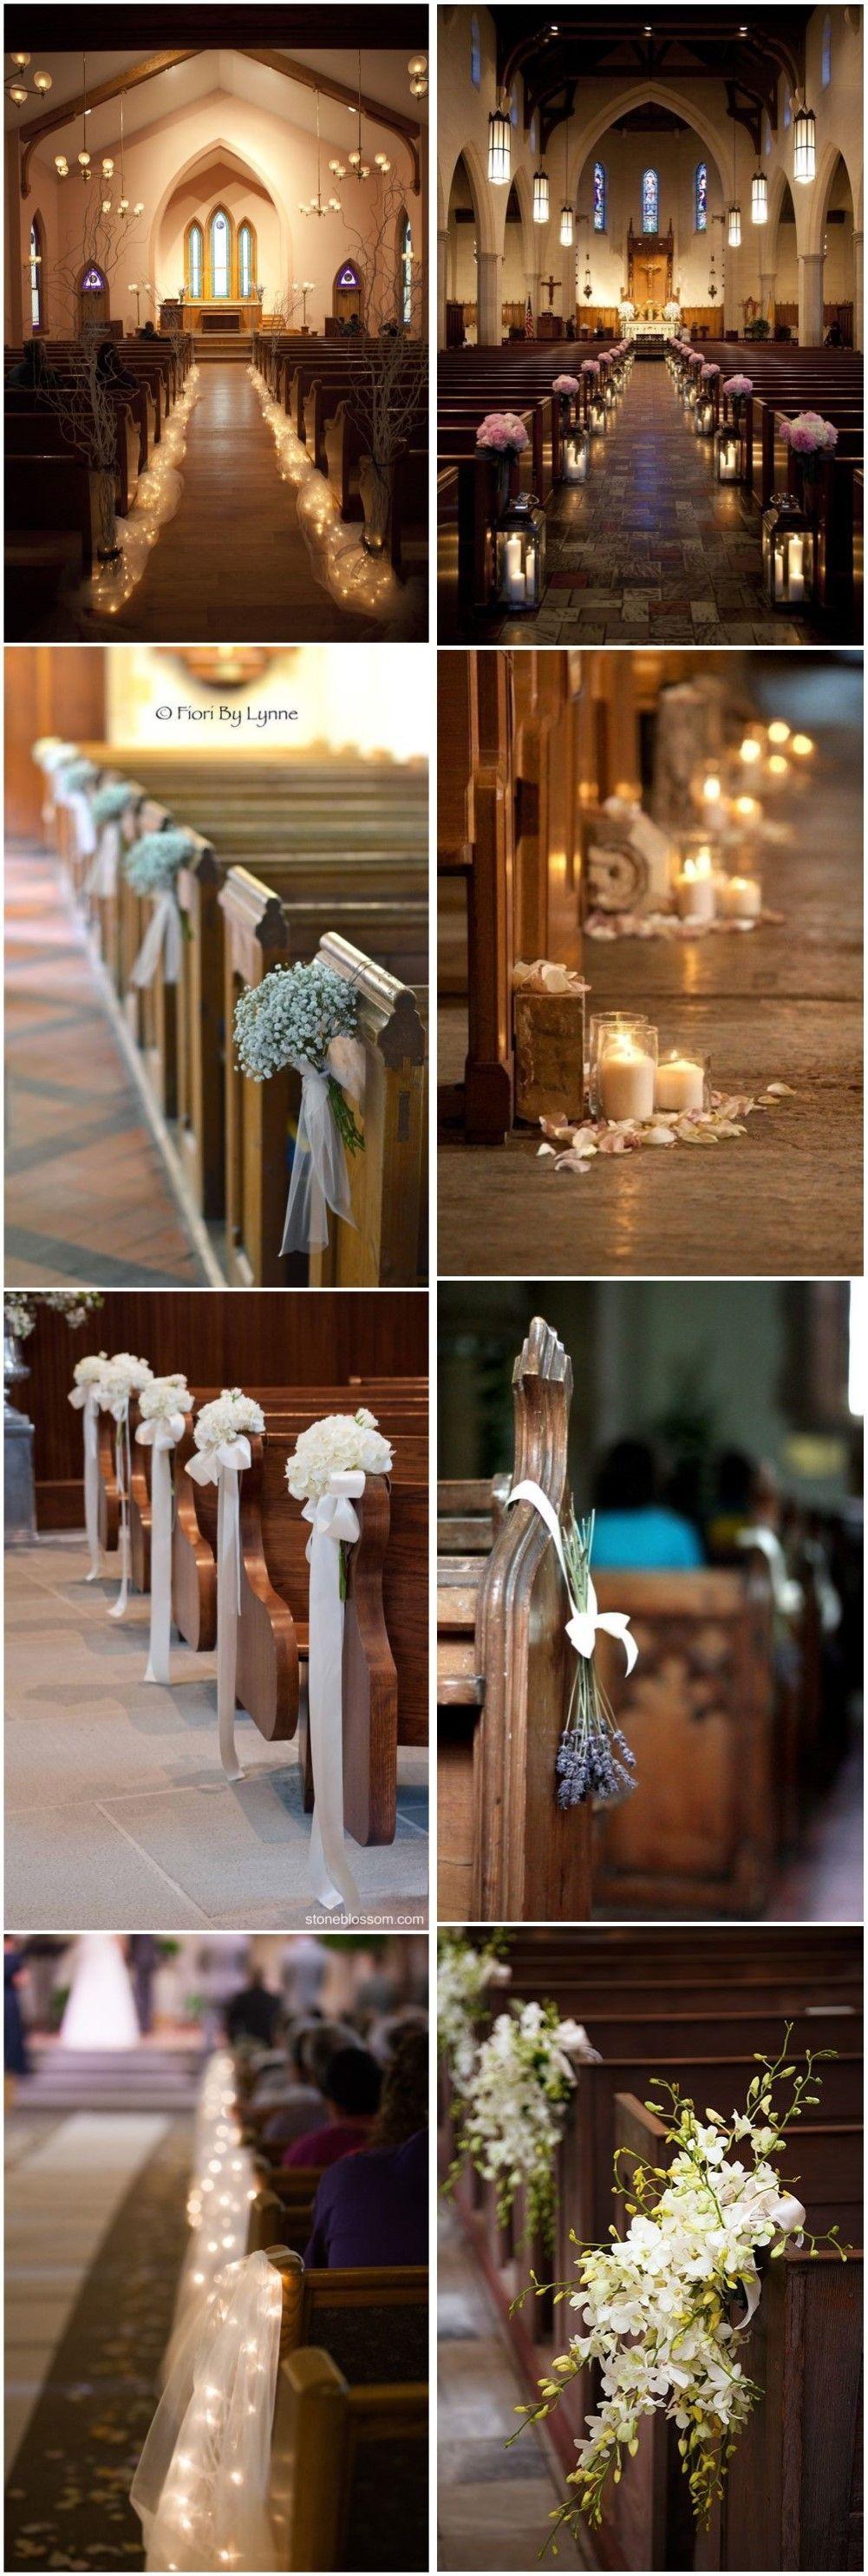 22+ Wedding pew decorations rustic ideas in 2021